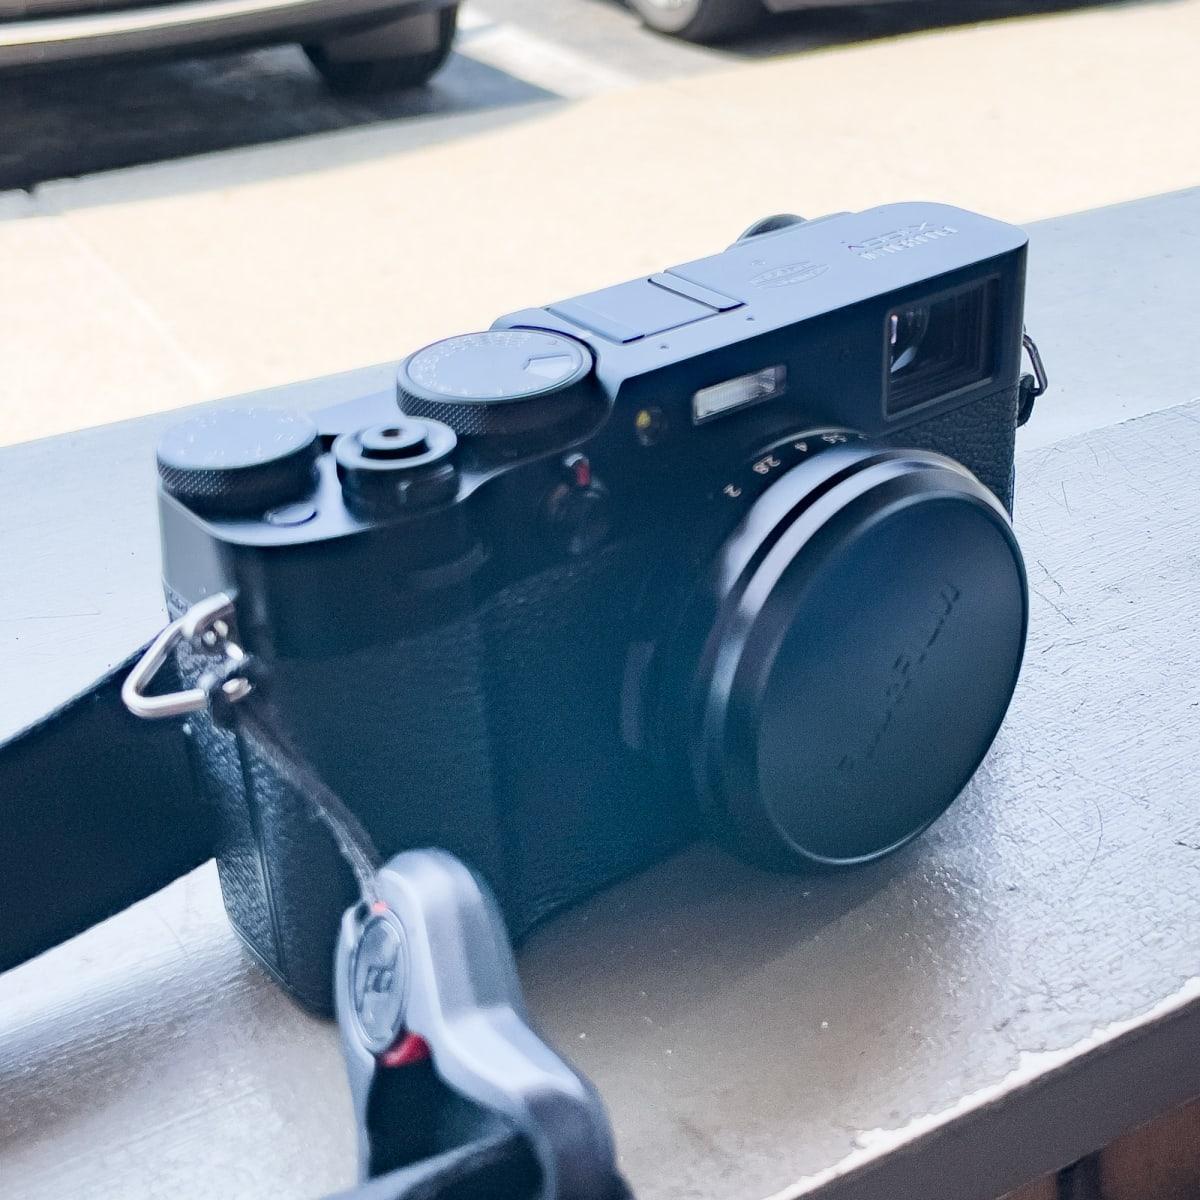 Fuji X100V camera with lens cap and strap